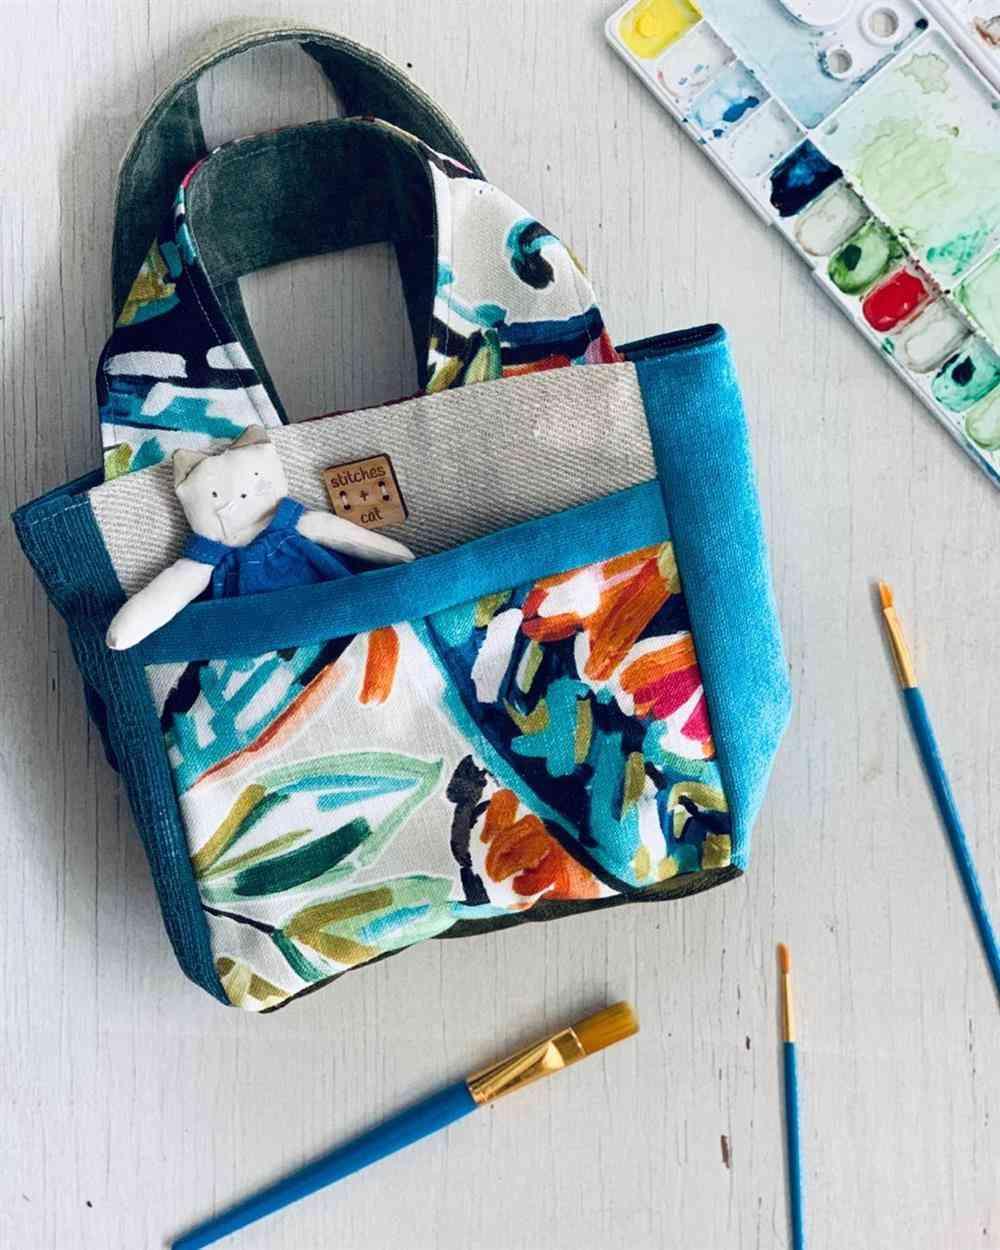 bolsa de retalhos tipo sacola